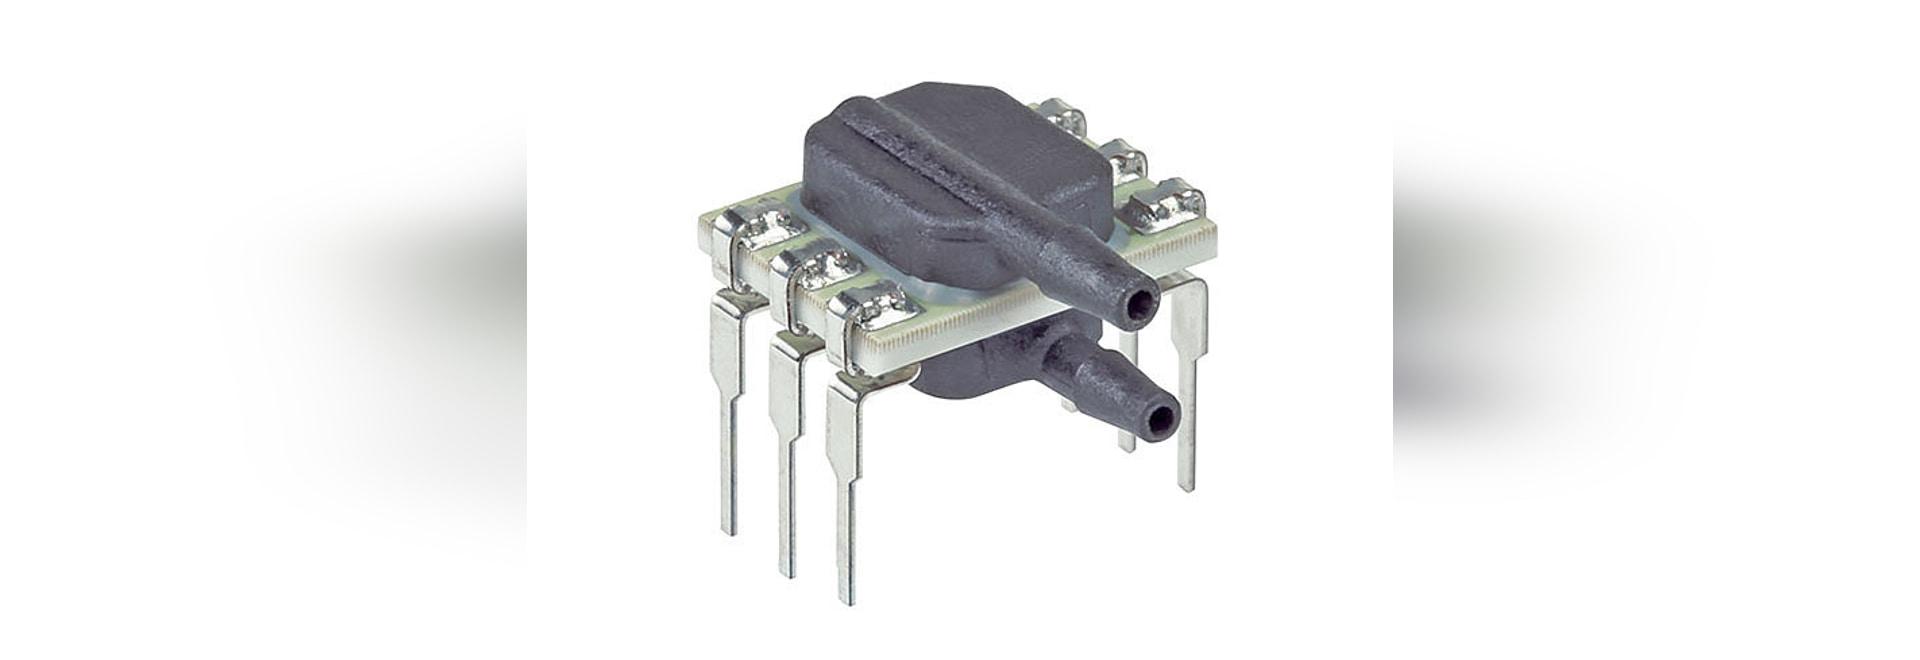 Neuer ABP Reihendruck-Sensor